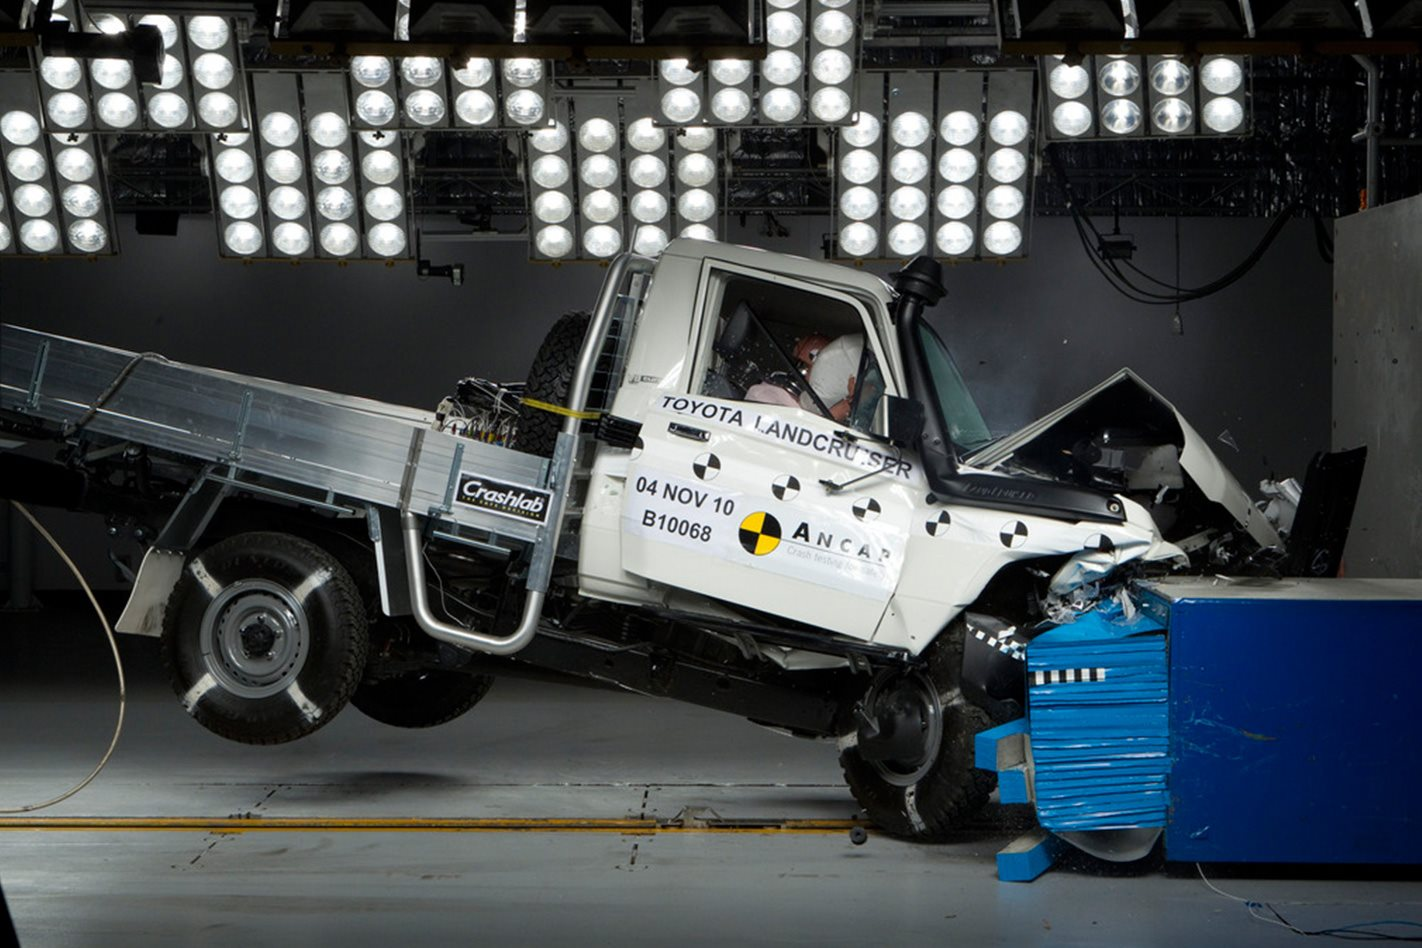 Toyota land cruiser 70 series gets lifeline with 2016 safety upgrade 4x4 australia